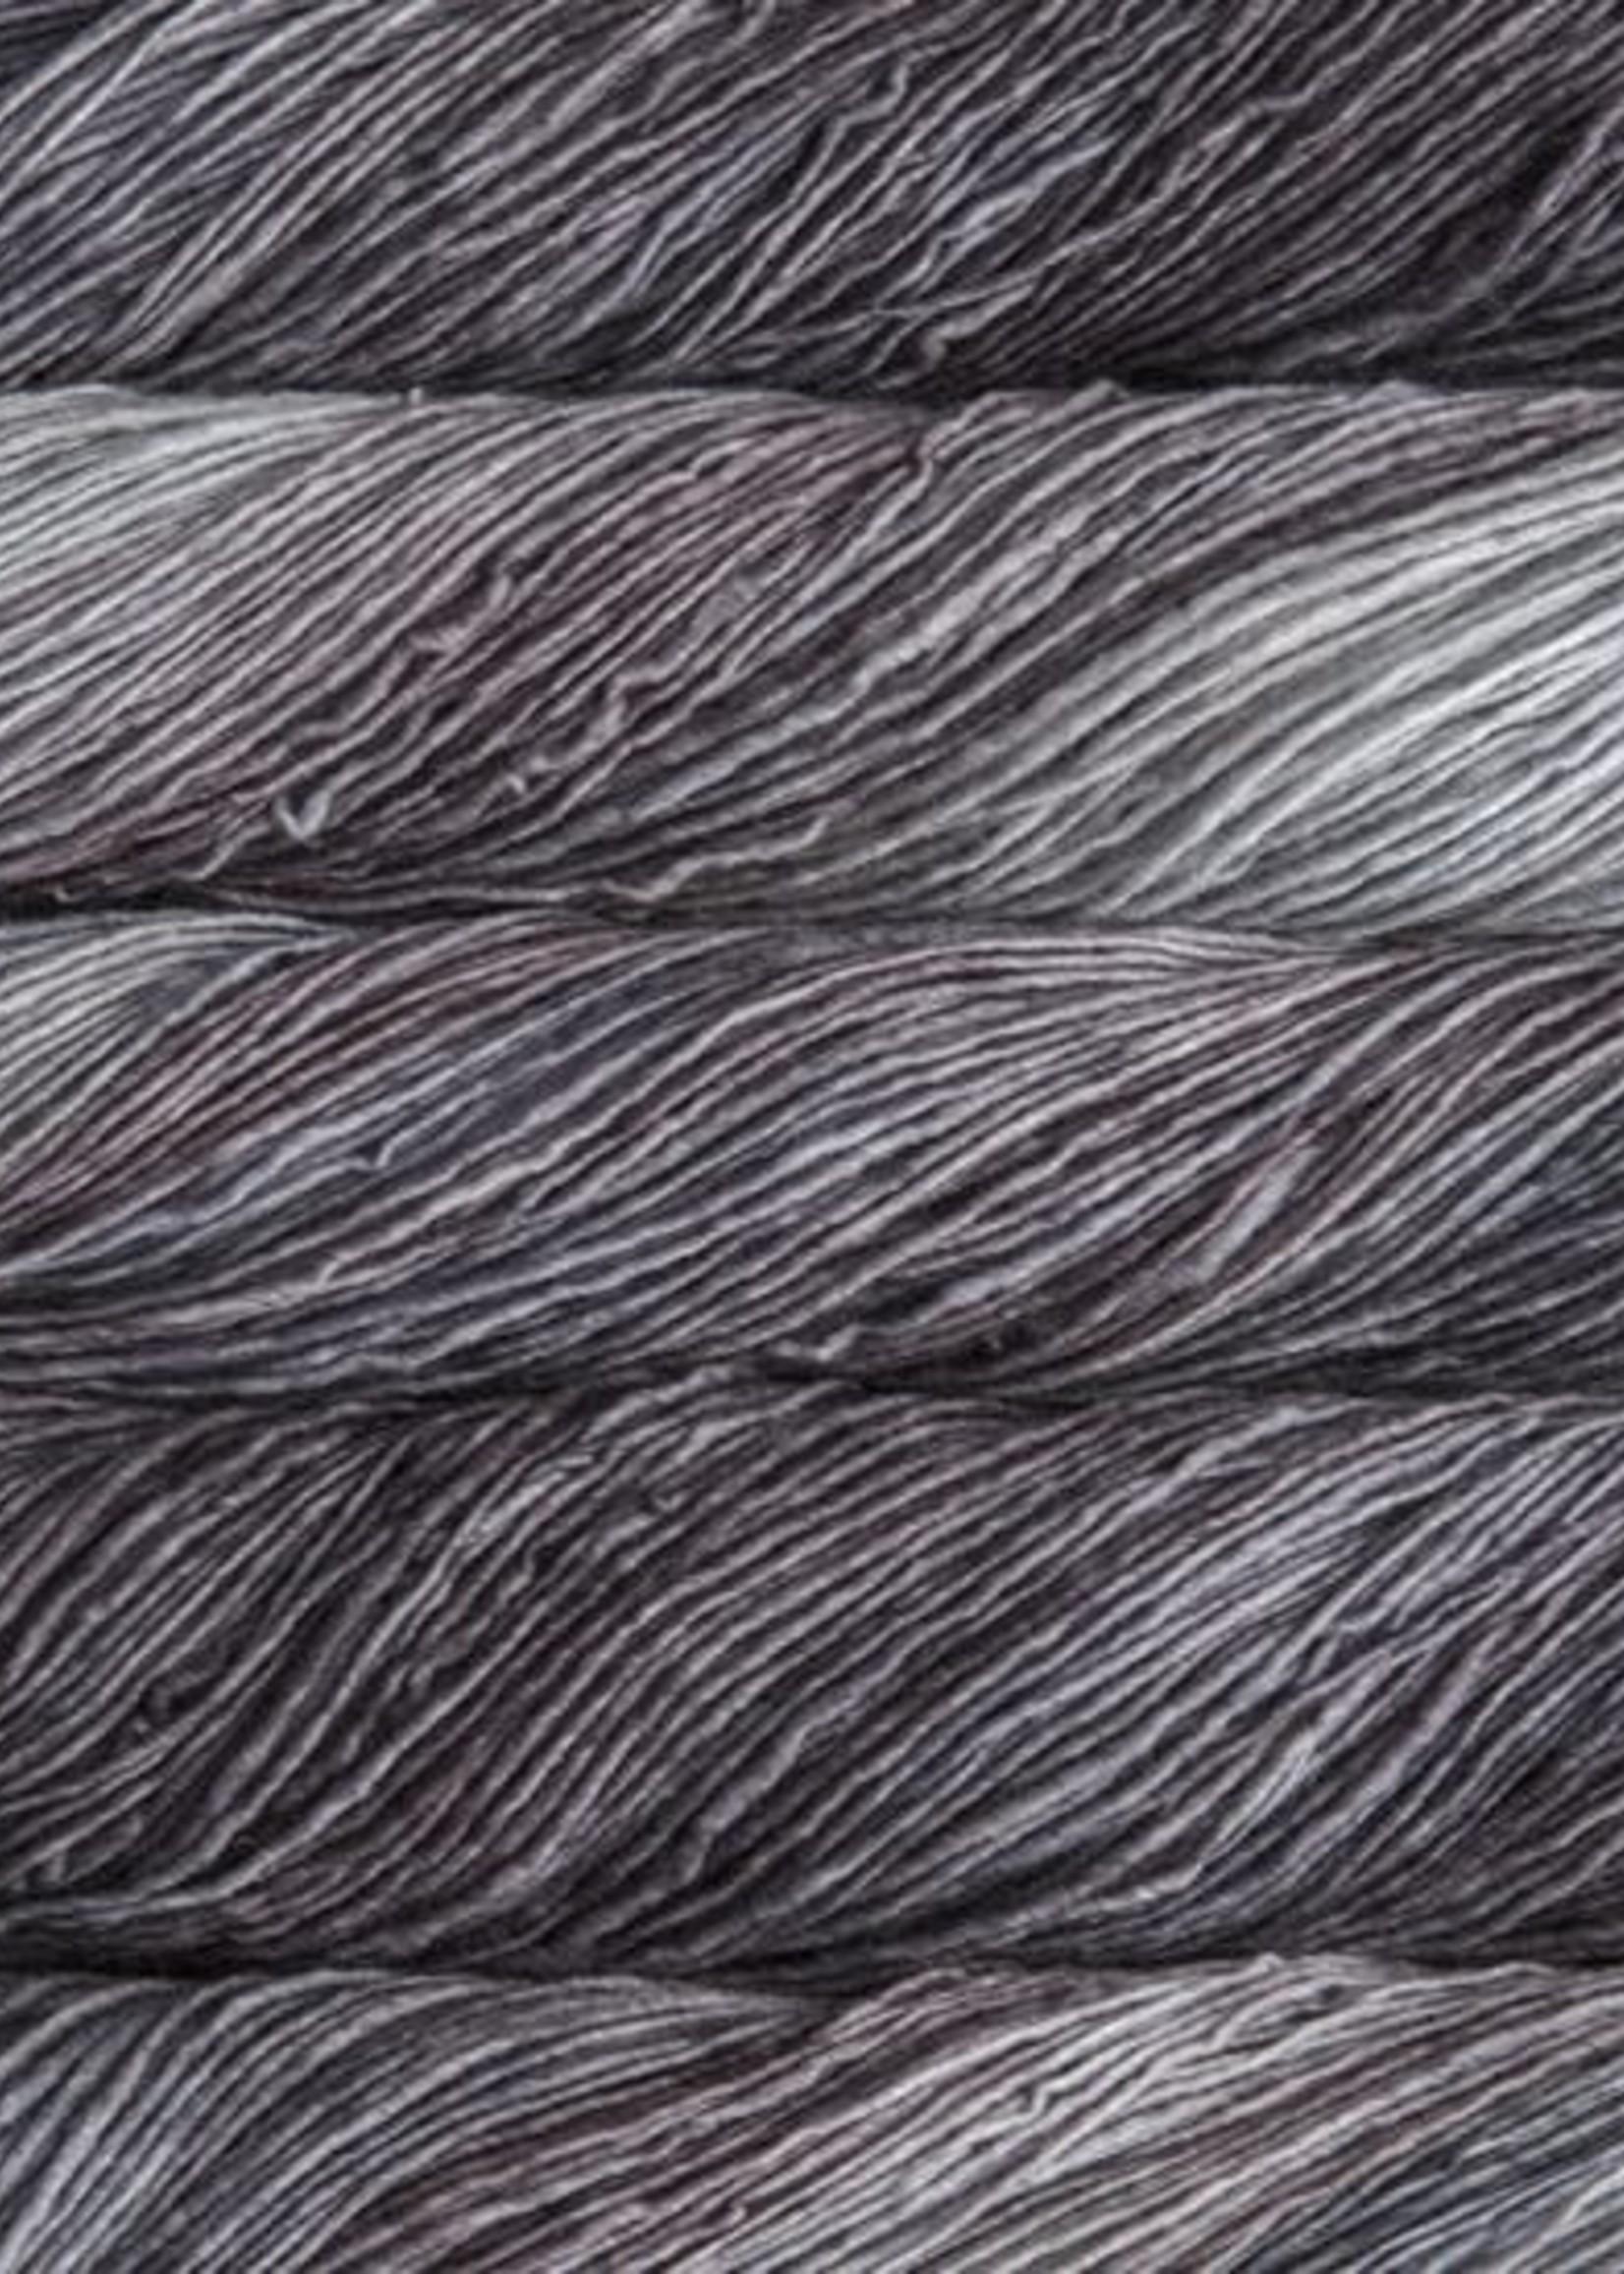 Malabrigo Yarn Malabrigo Mechita Yarn #043 Plomo